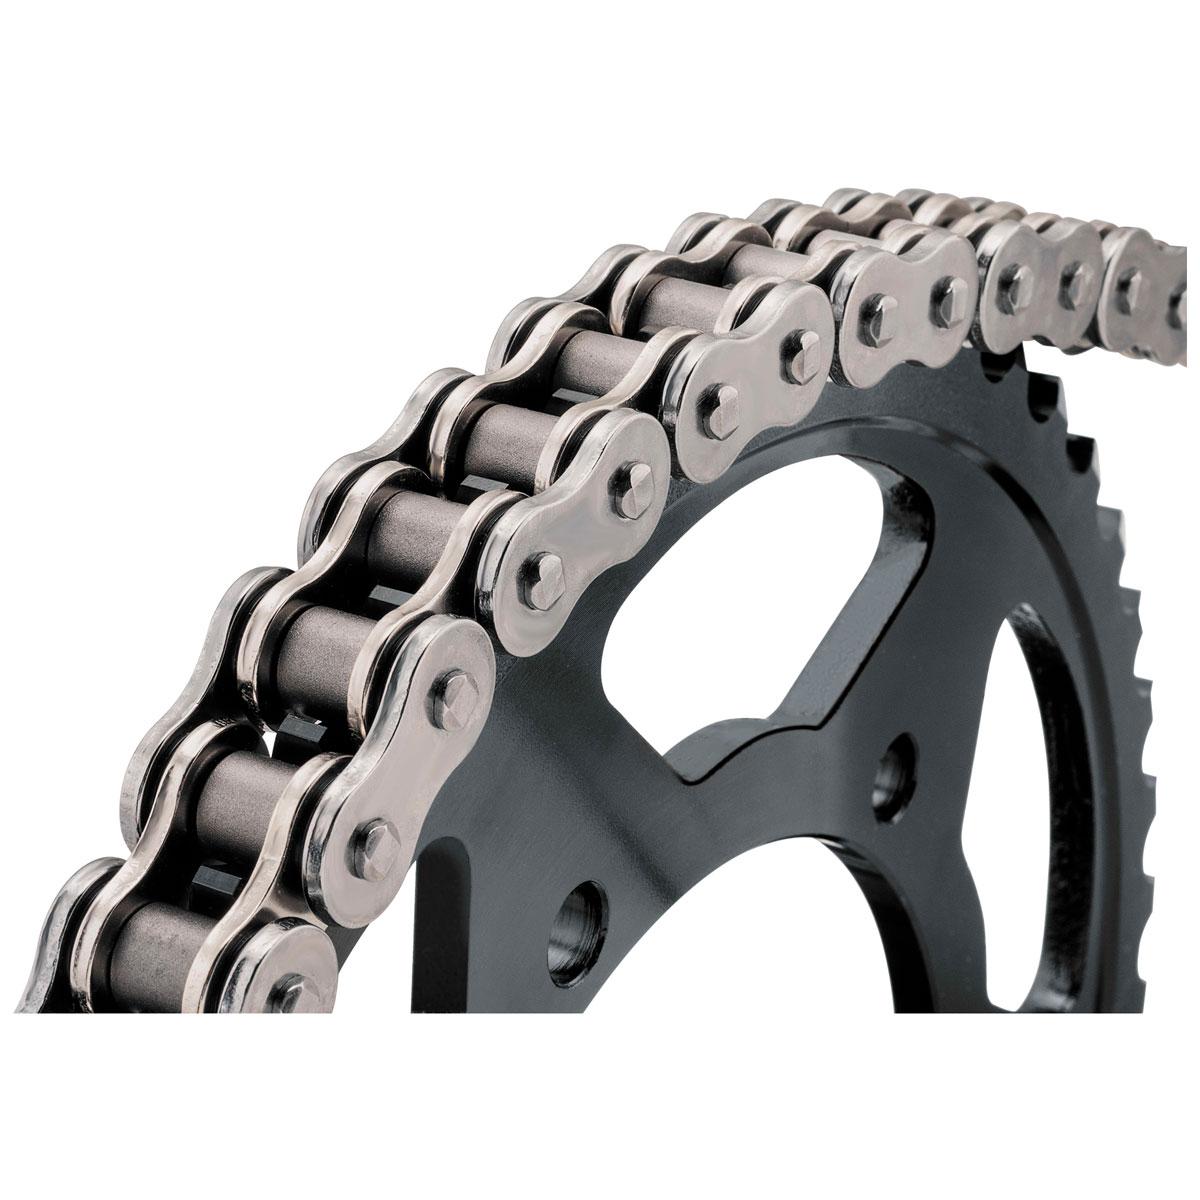 BikeMaster 530 HD Precision Roller Chain